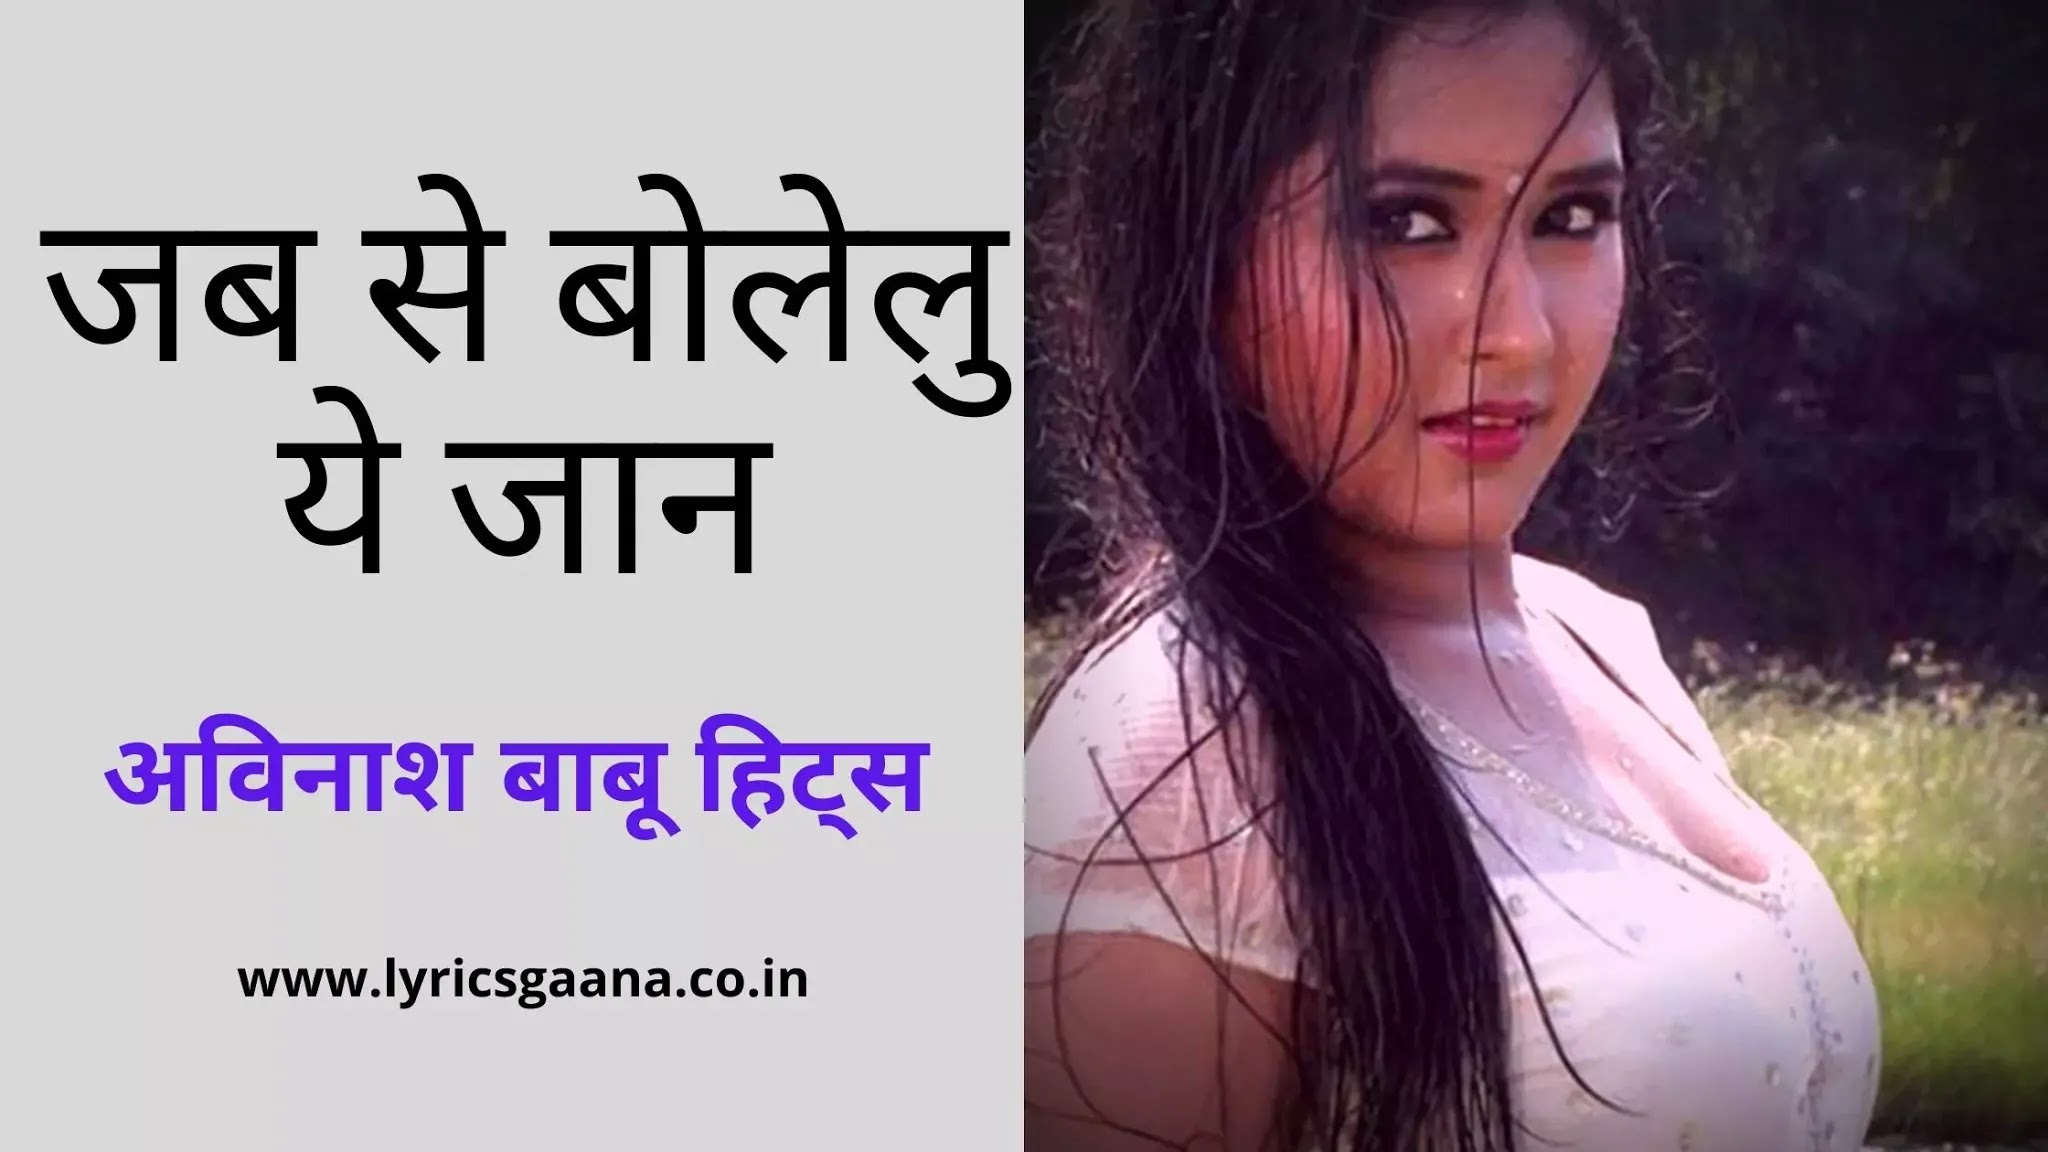 Tu Haske Bolelu Ye Jaan  तू हँस के बोललू Bhojpuri Song Lyrics